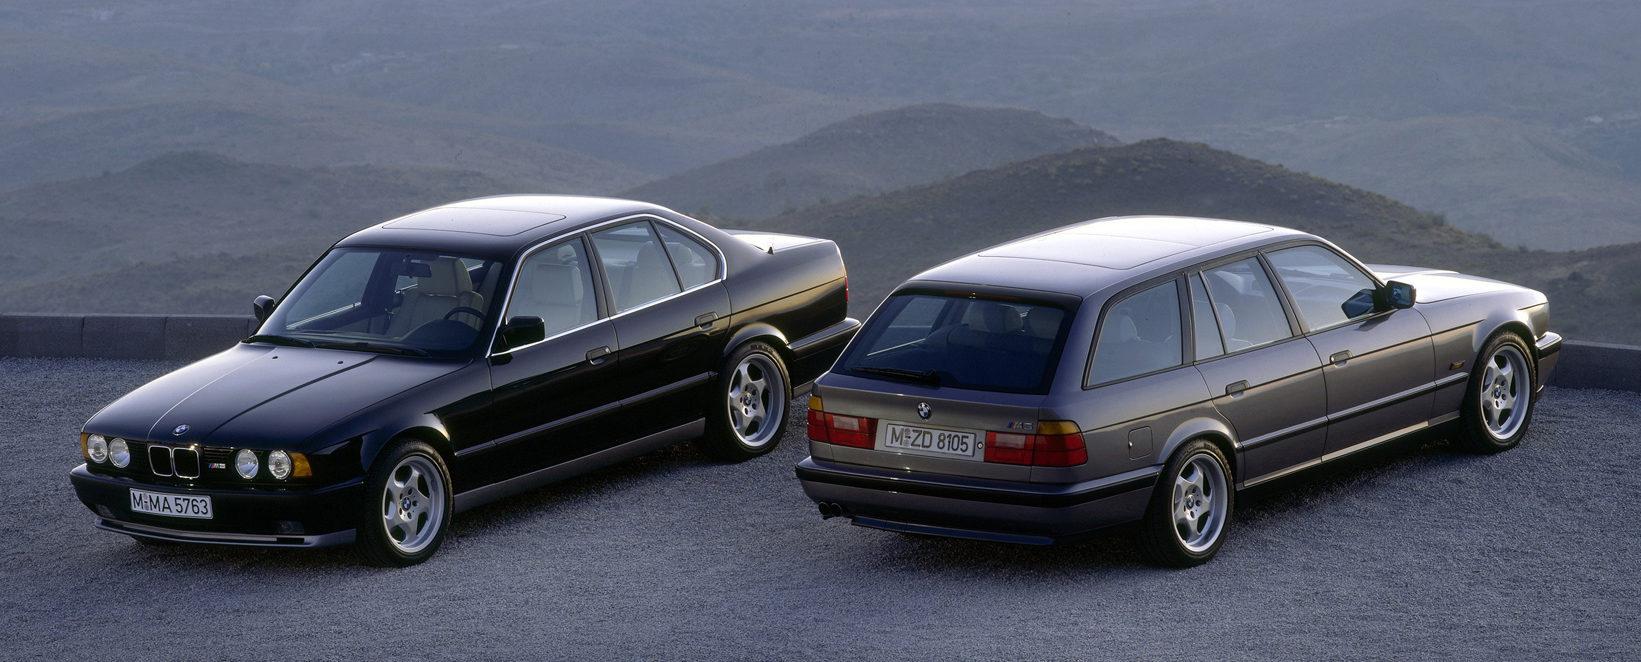 BMW-M5-E34-1920x1080-002